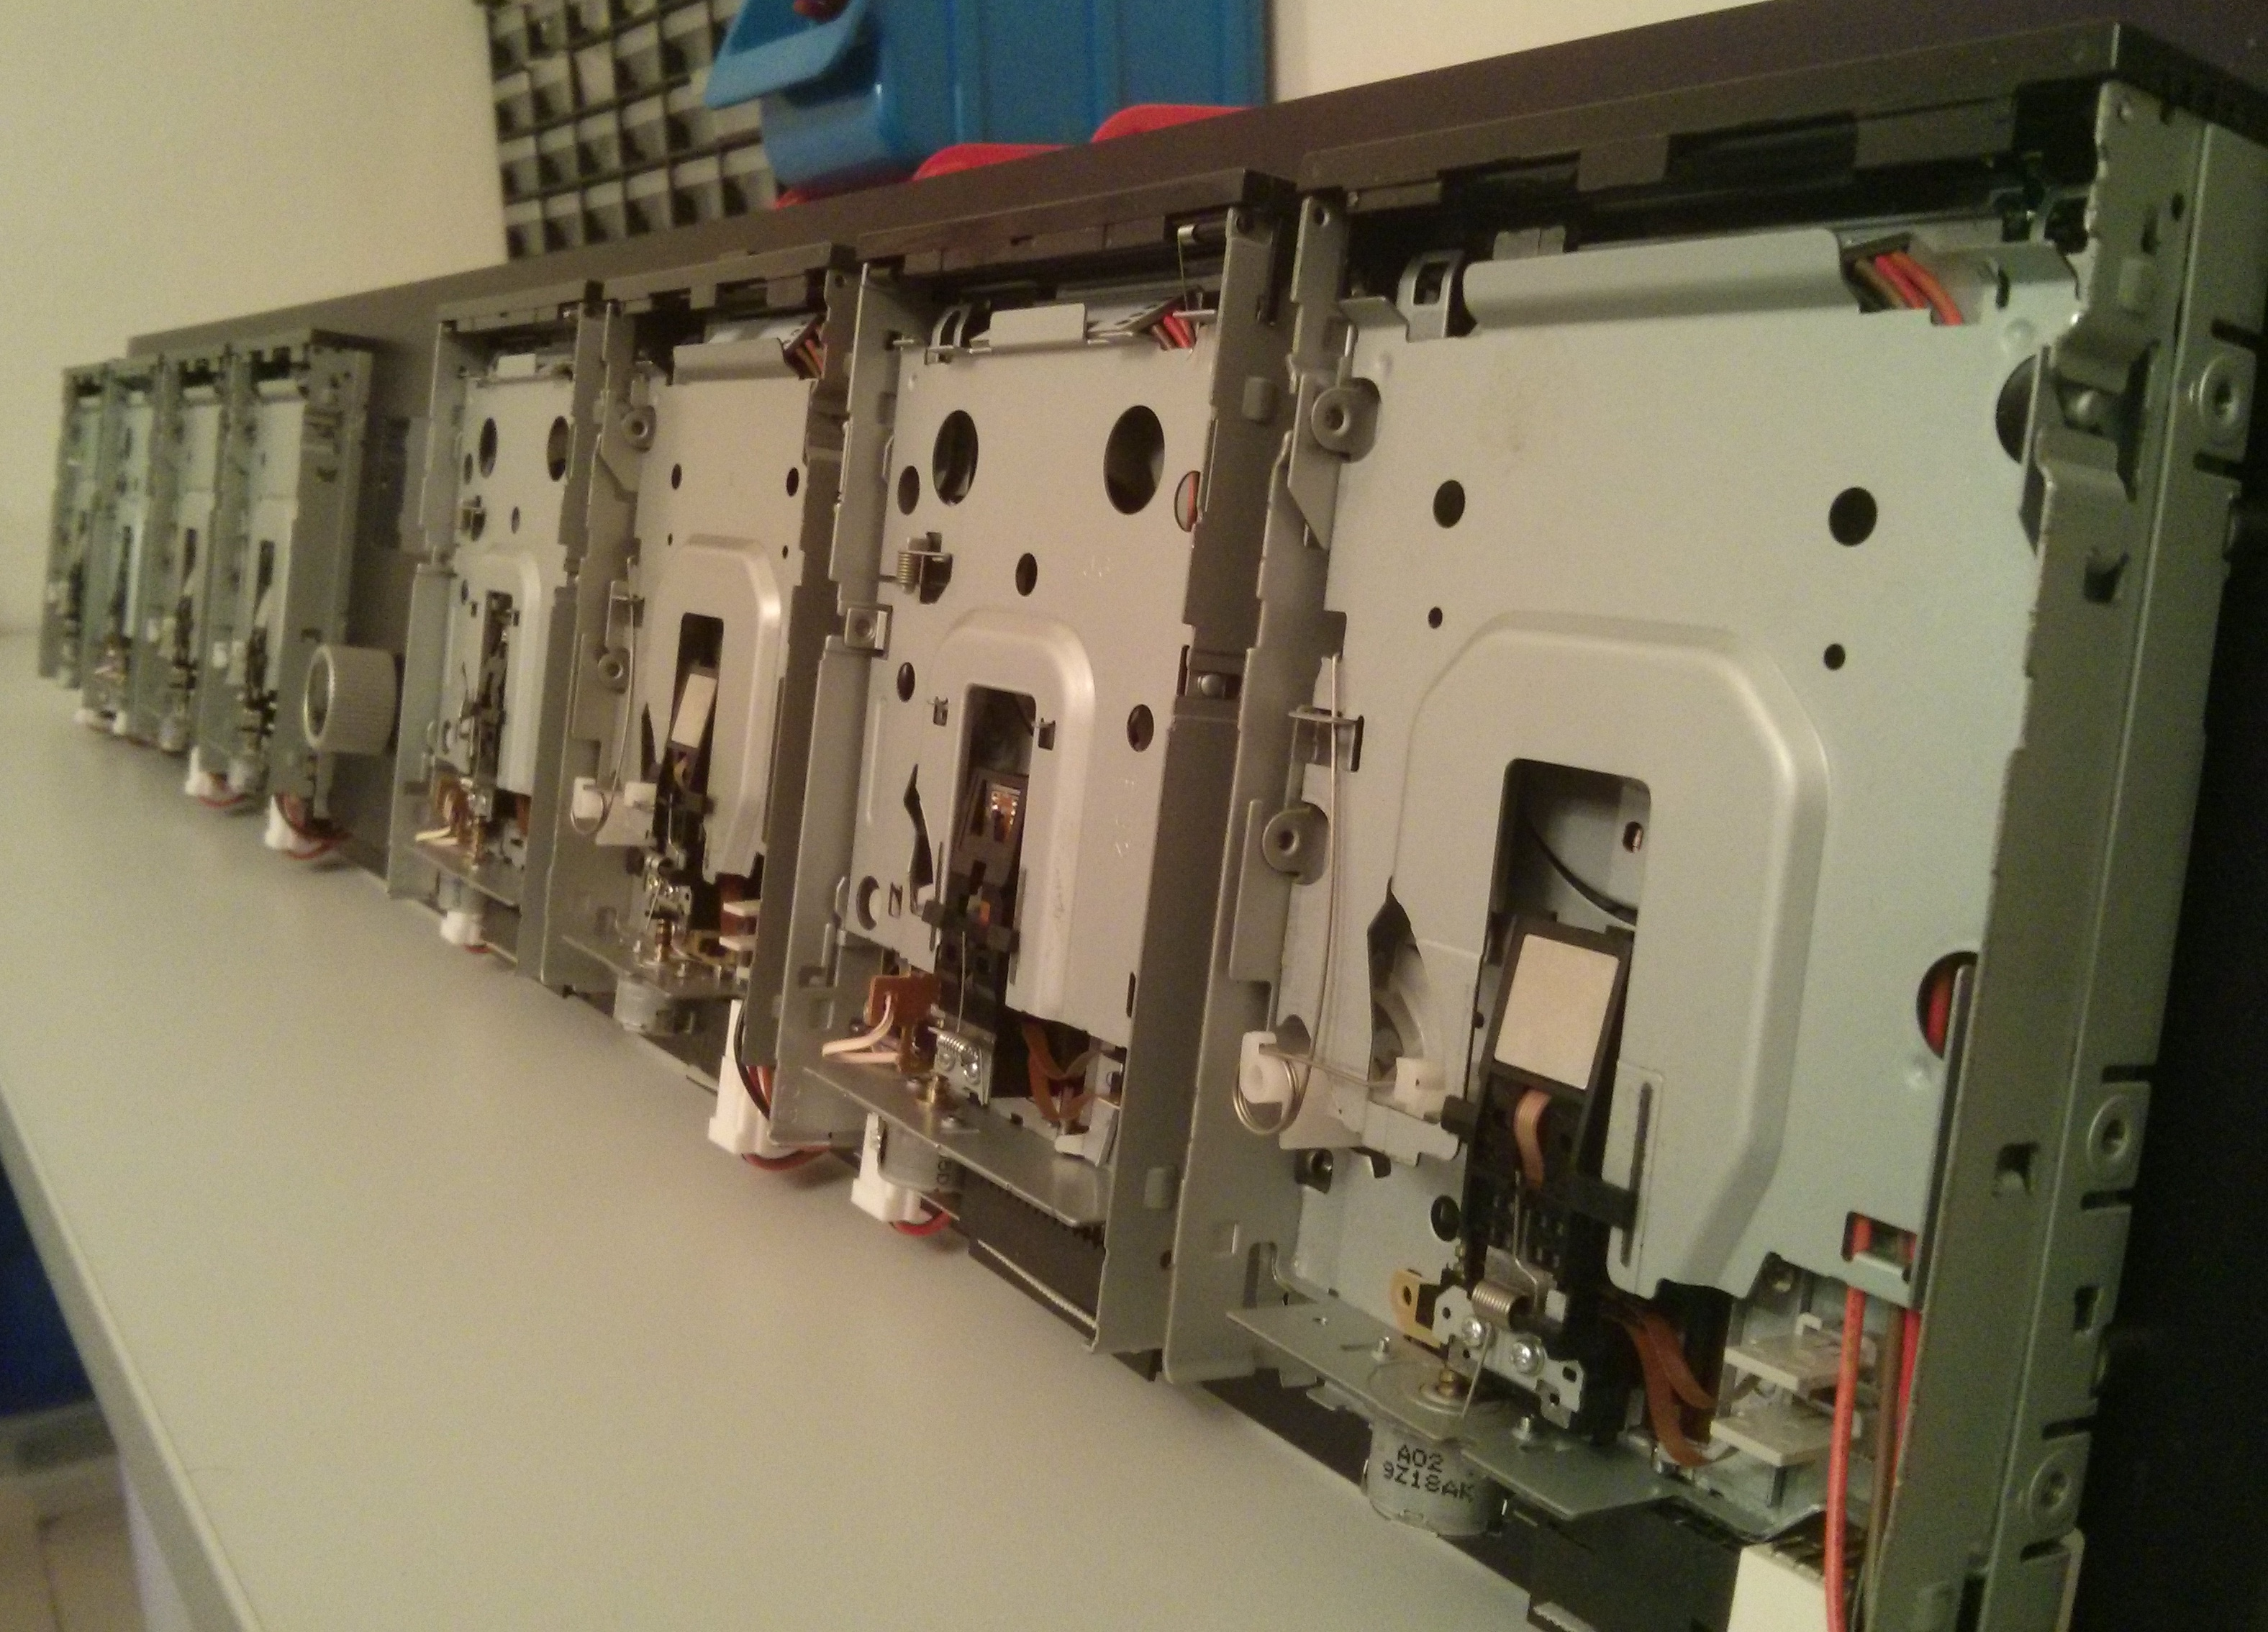 floppy disk jukebox